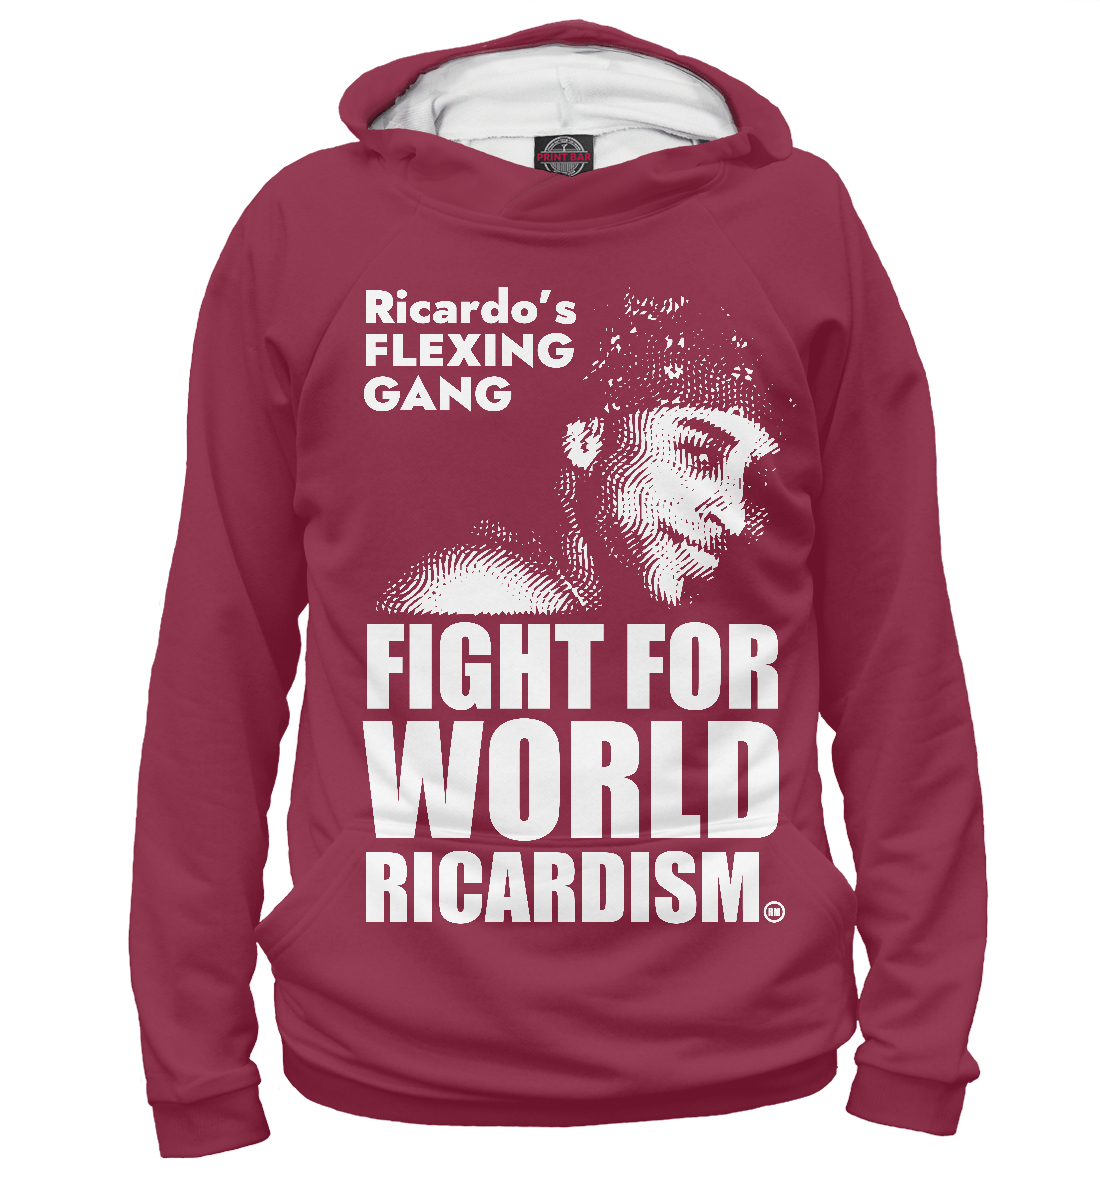 Фото - Fight for Ricardo josé ricardo chaves faustófeles